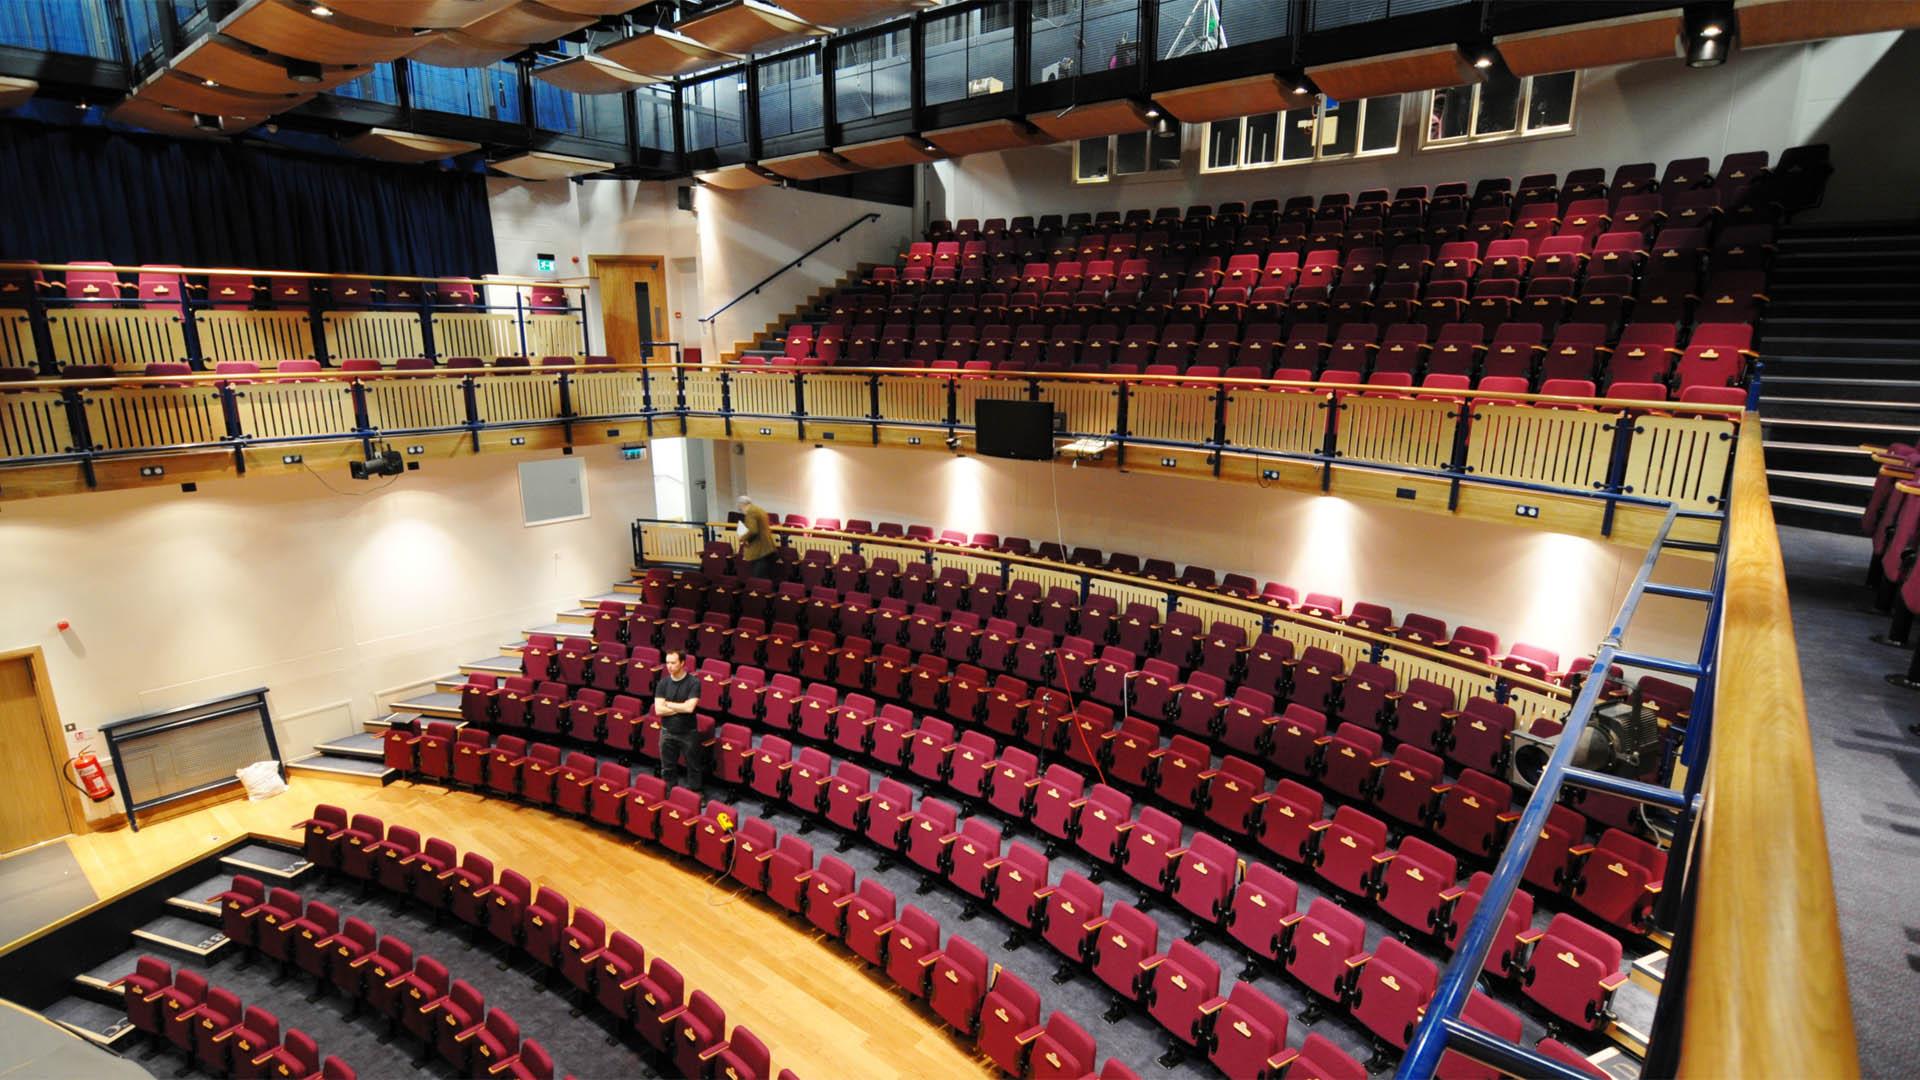 Hammond Theatre Hampton School Adrian James Acoustics